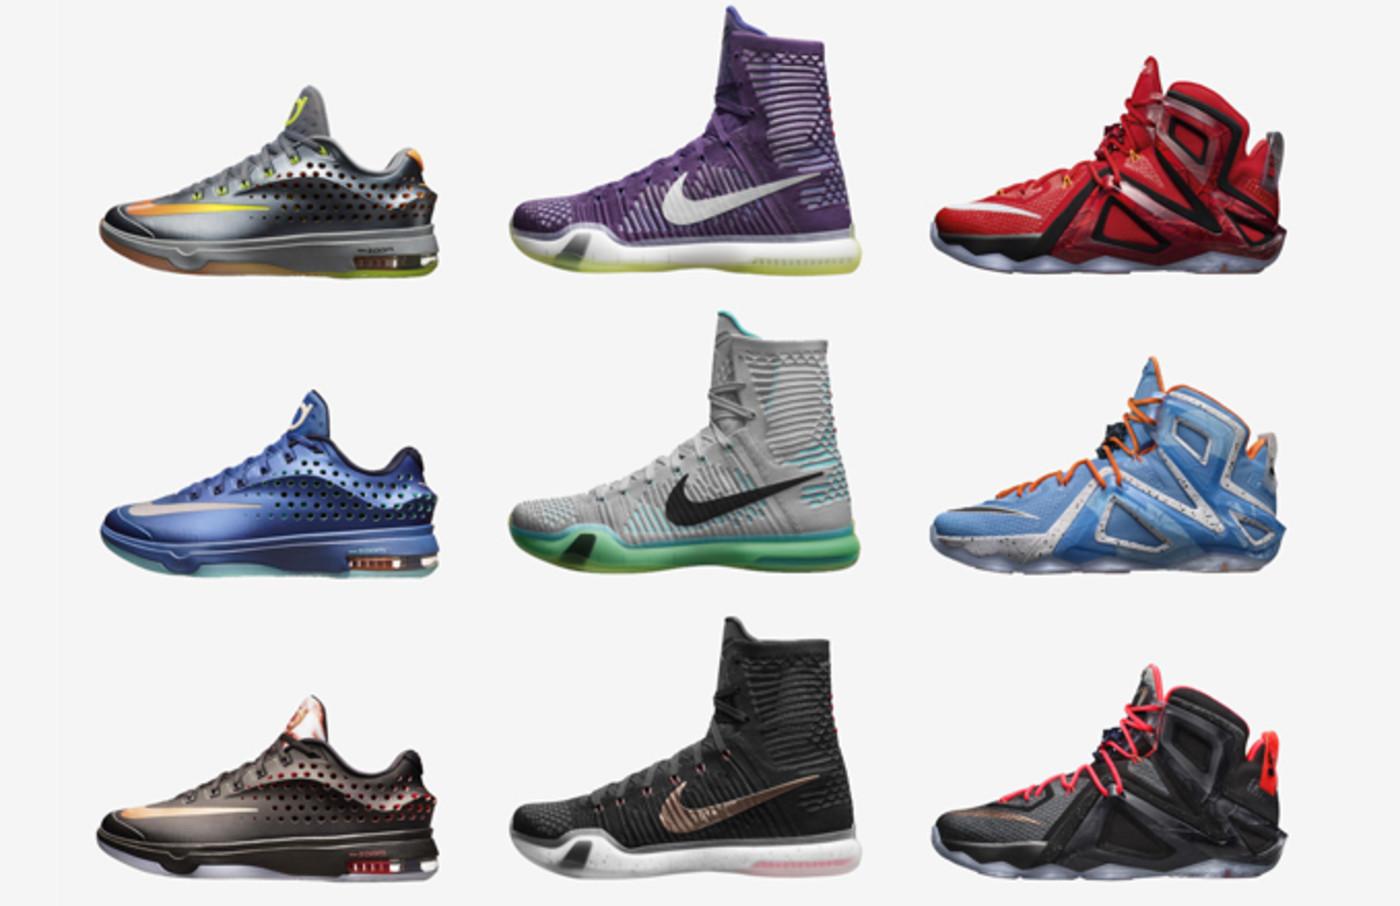 unidad Sala siga adelante  Nike Unveils this Year's Elite Series Team Collection 2015 | Complex